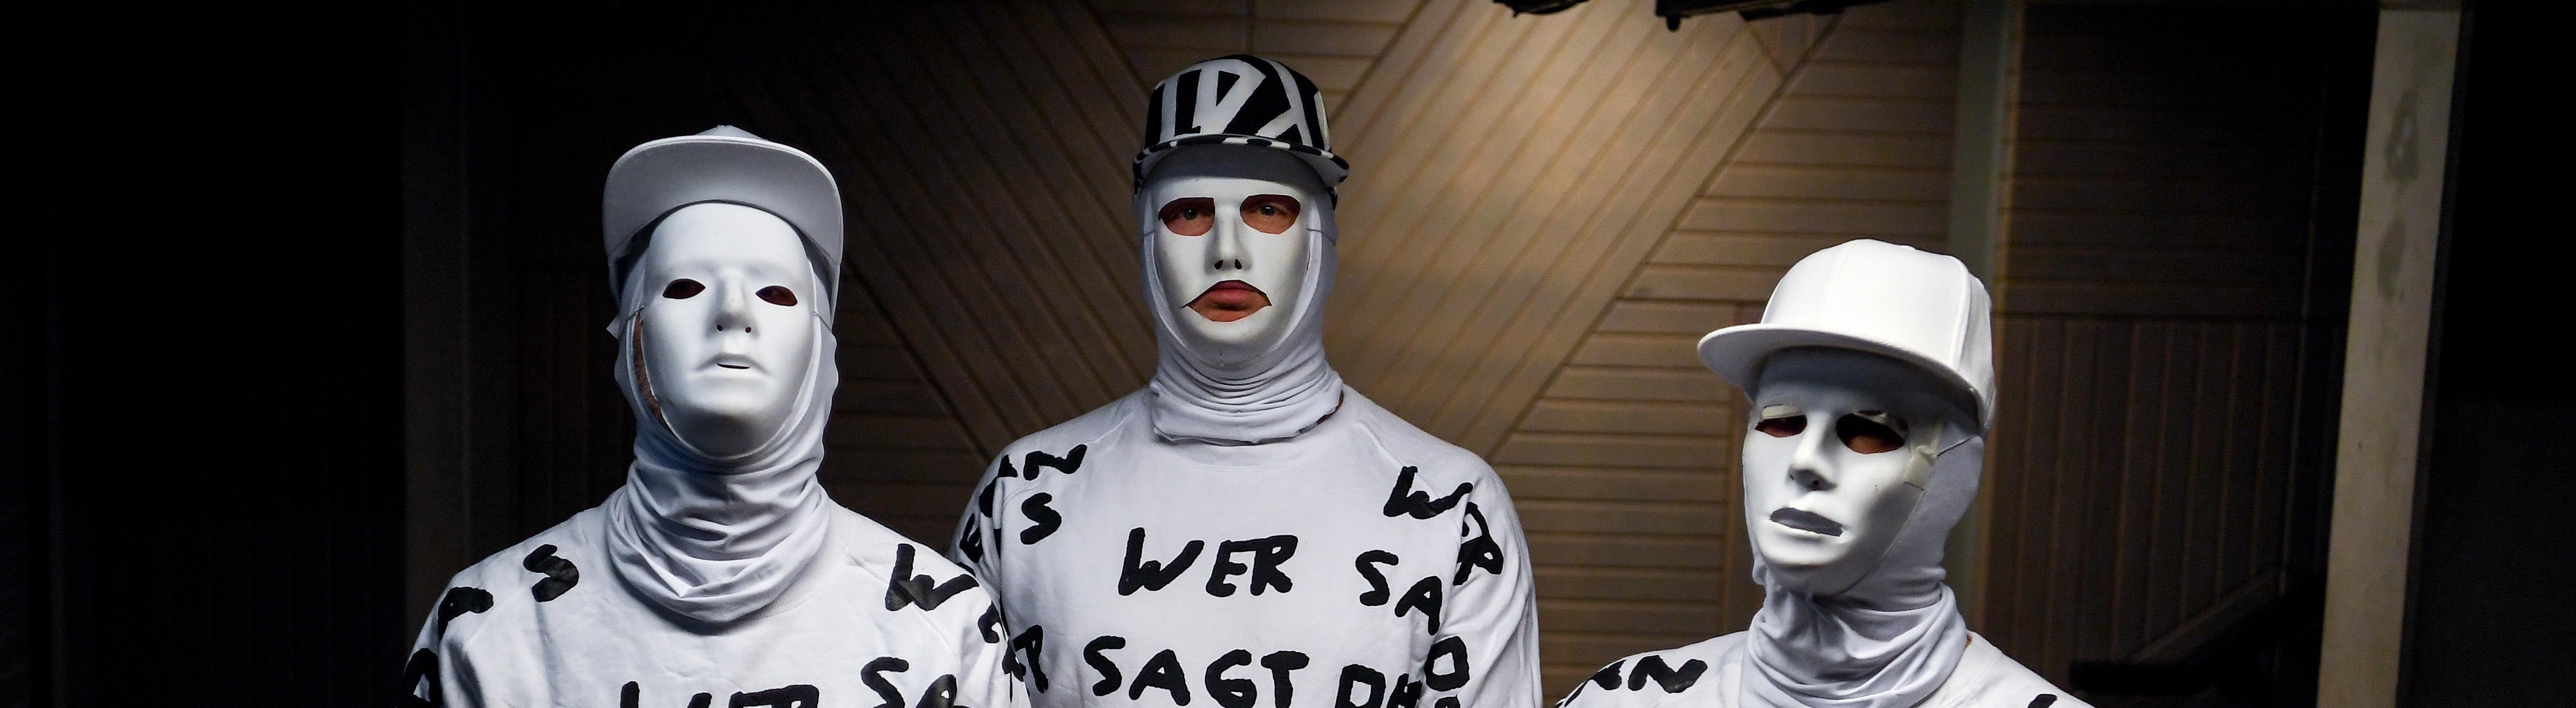 2.08.2019, Berlin: Philipp Grütering (l-r) alias Kryptik Joe, Sebastian Dürre alias Porky und Henning Besser alias La Perla der Band Deichkind.